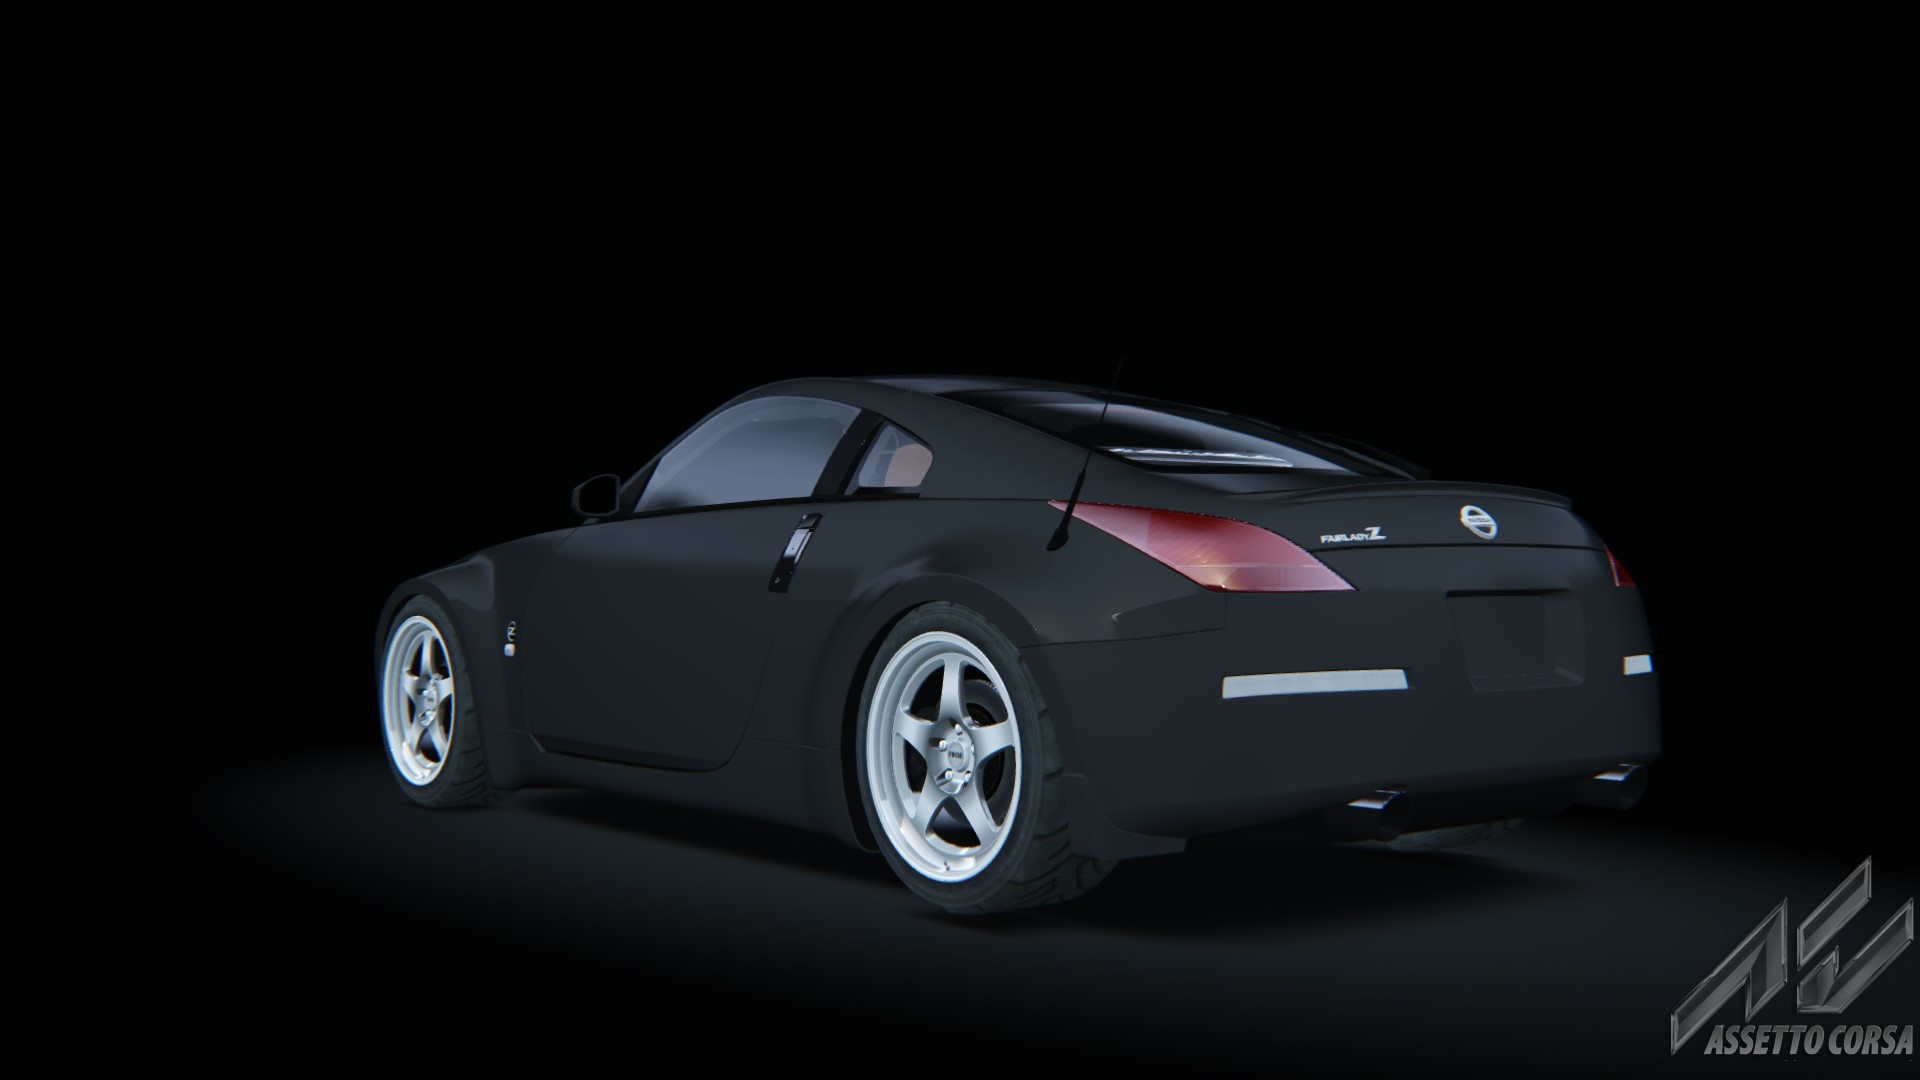 Nissan 350z - Nissan - Car Detail - Assetto Corsa Database